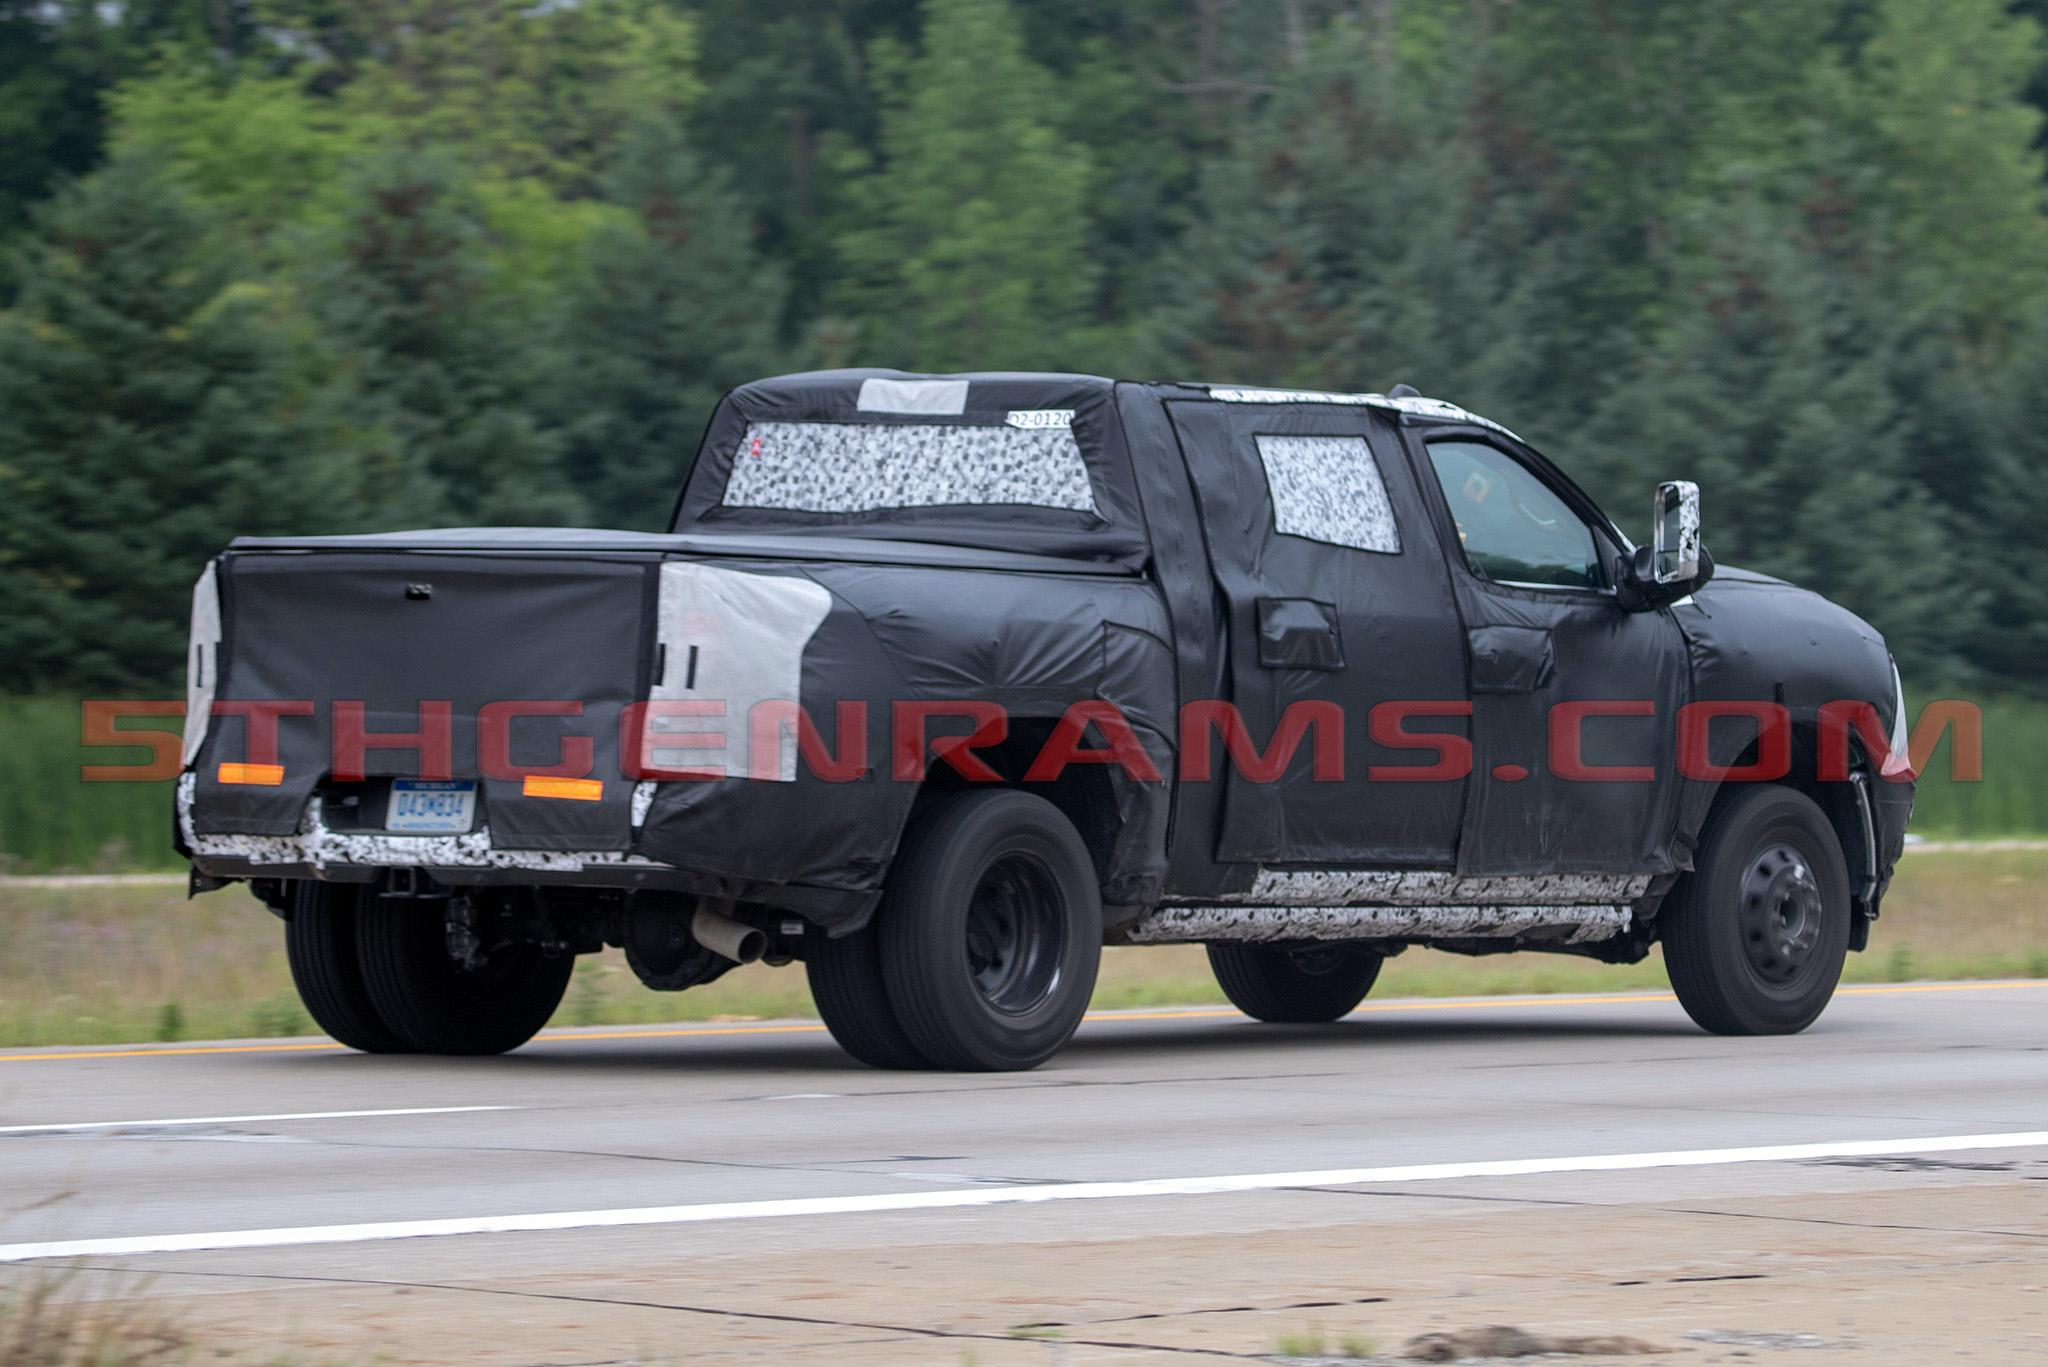 2020 Ram 3500 Dually, Mega Cab, Specs, Price >> Meet The 2019 Ram 3500 Mega Cab Laramie Longhorn Dually